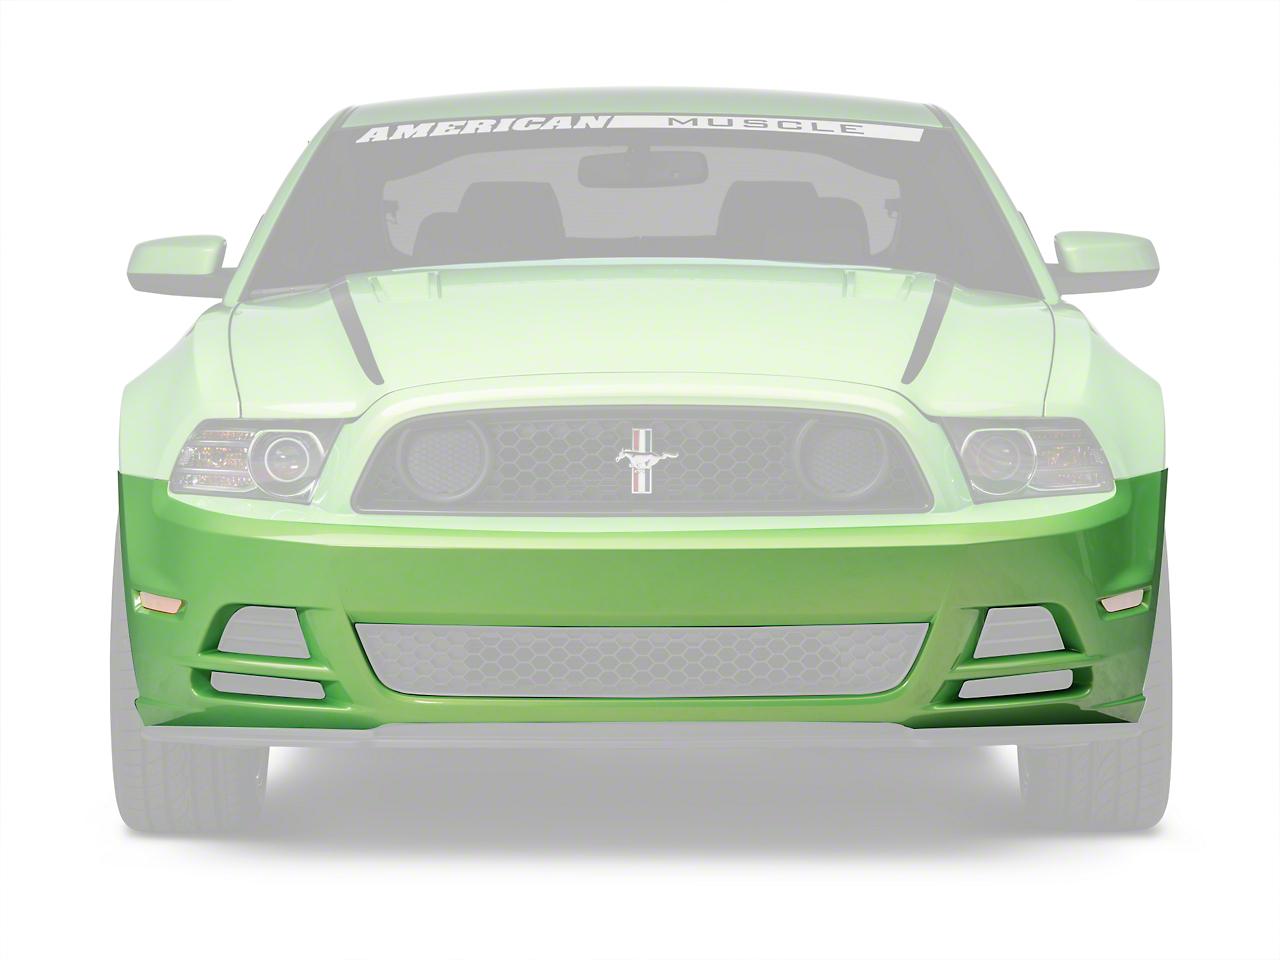 3M Paint Protection Film - Lower Front Bumper (13-14 GT)